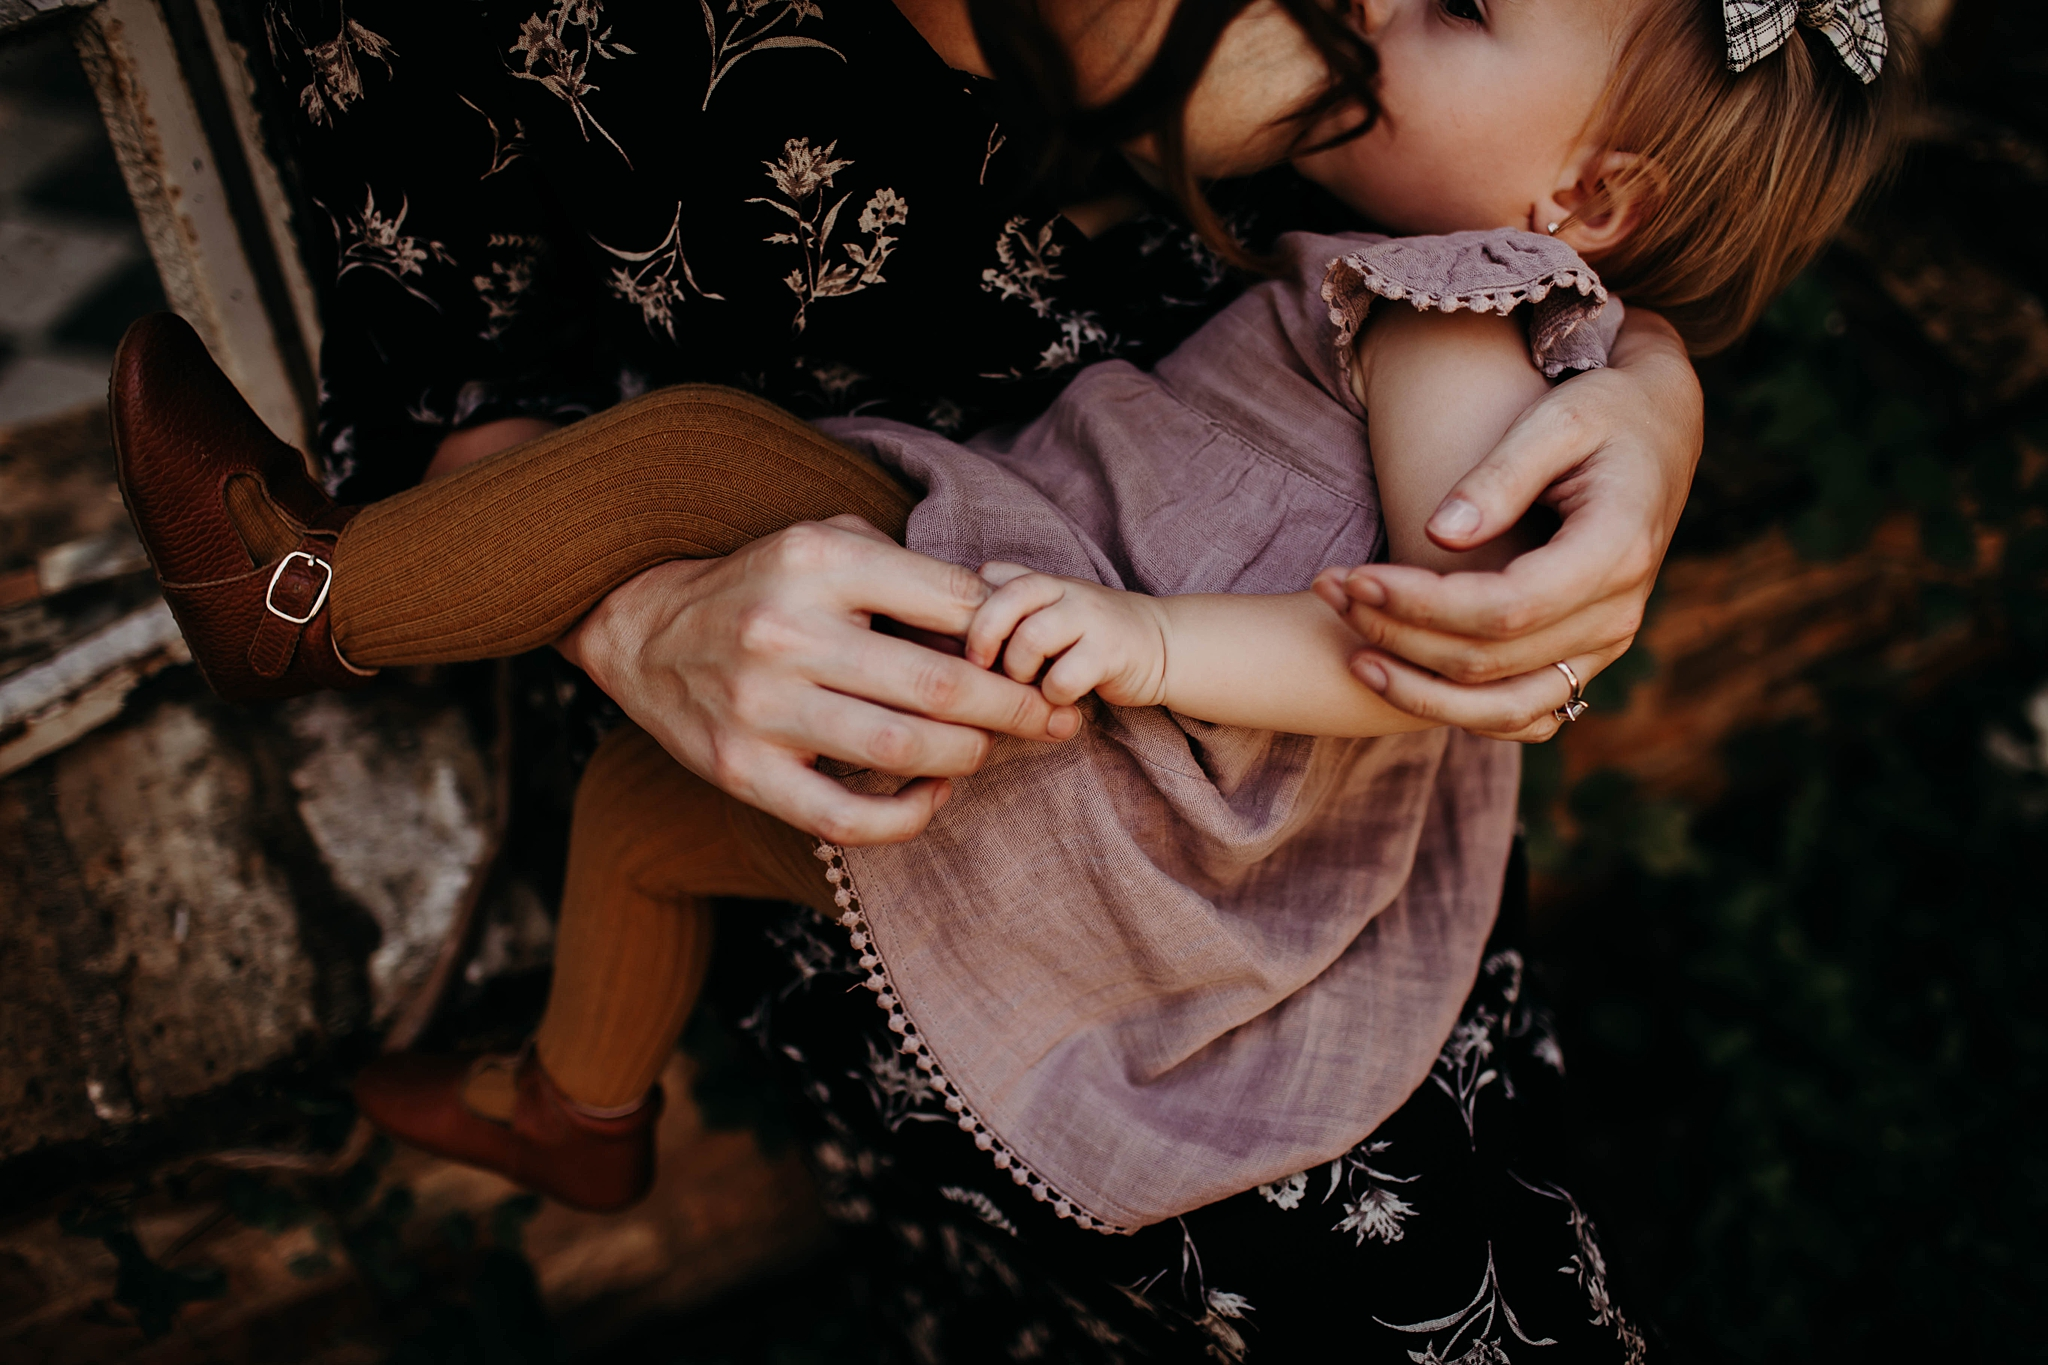 Luera-VMP-San-Antonio-Family-Photography-23_WEB.jpg